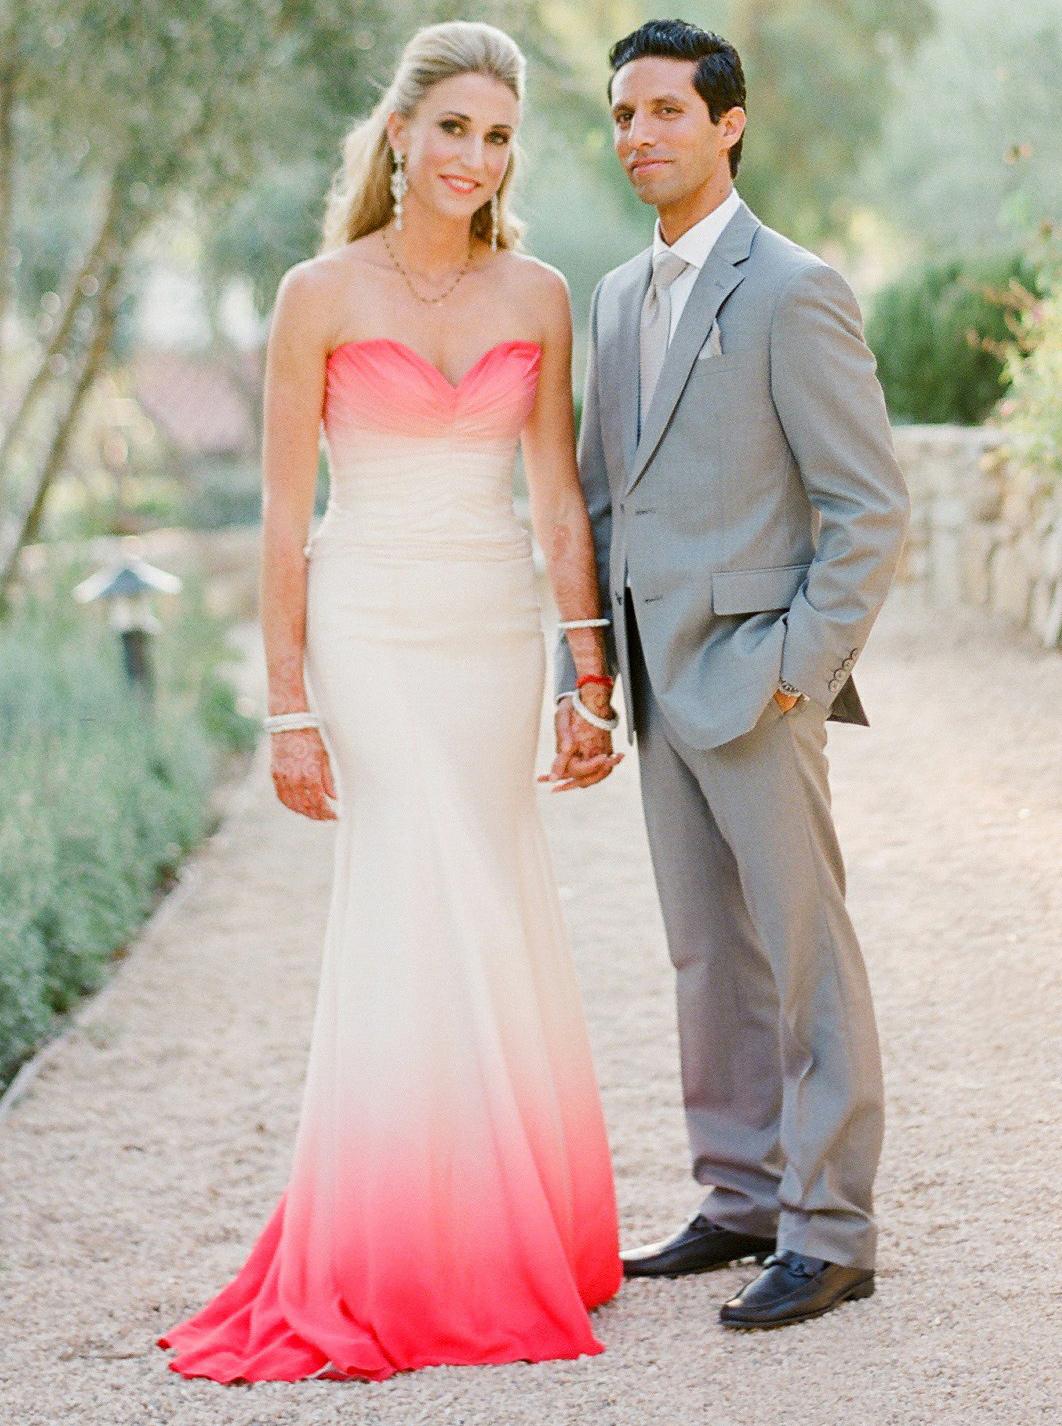 Mermaid Sweetheart Watermelon Red Dyed Chiffon Wedding Dress фото